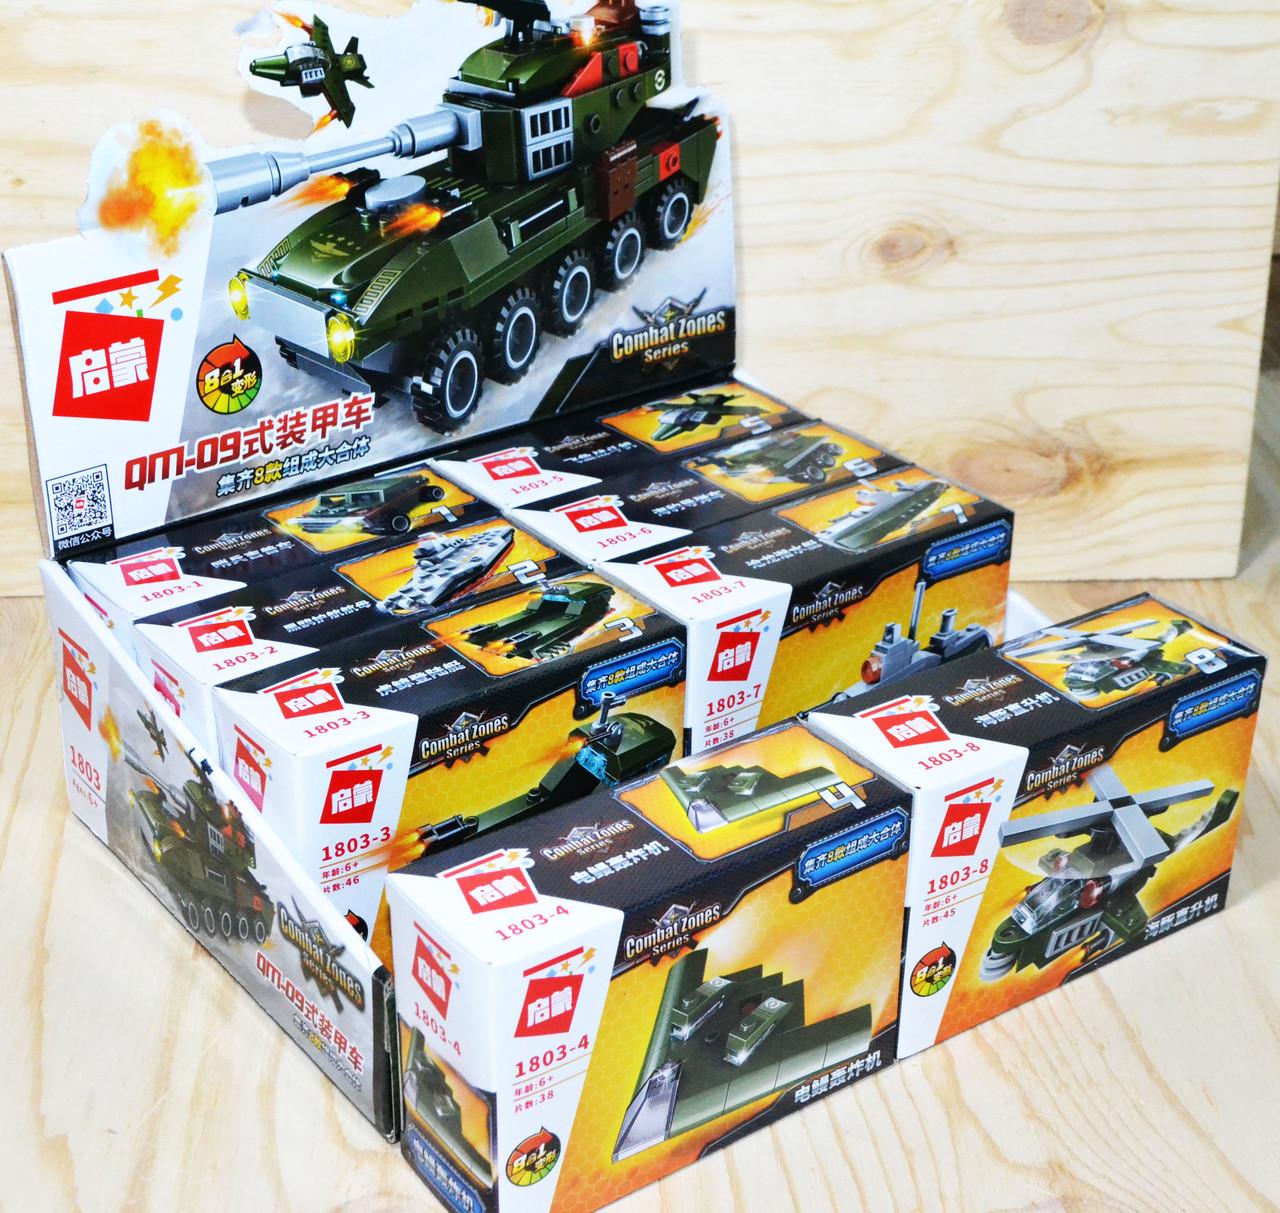 1803 Военная техника констр. Combat Zones 8шт,цена за 1шт 13*9см